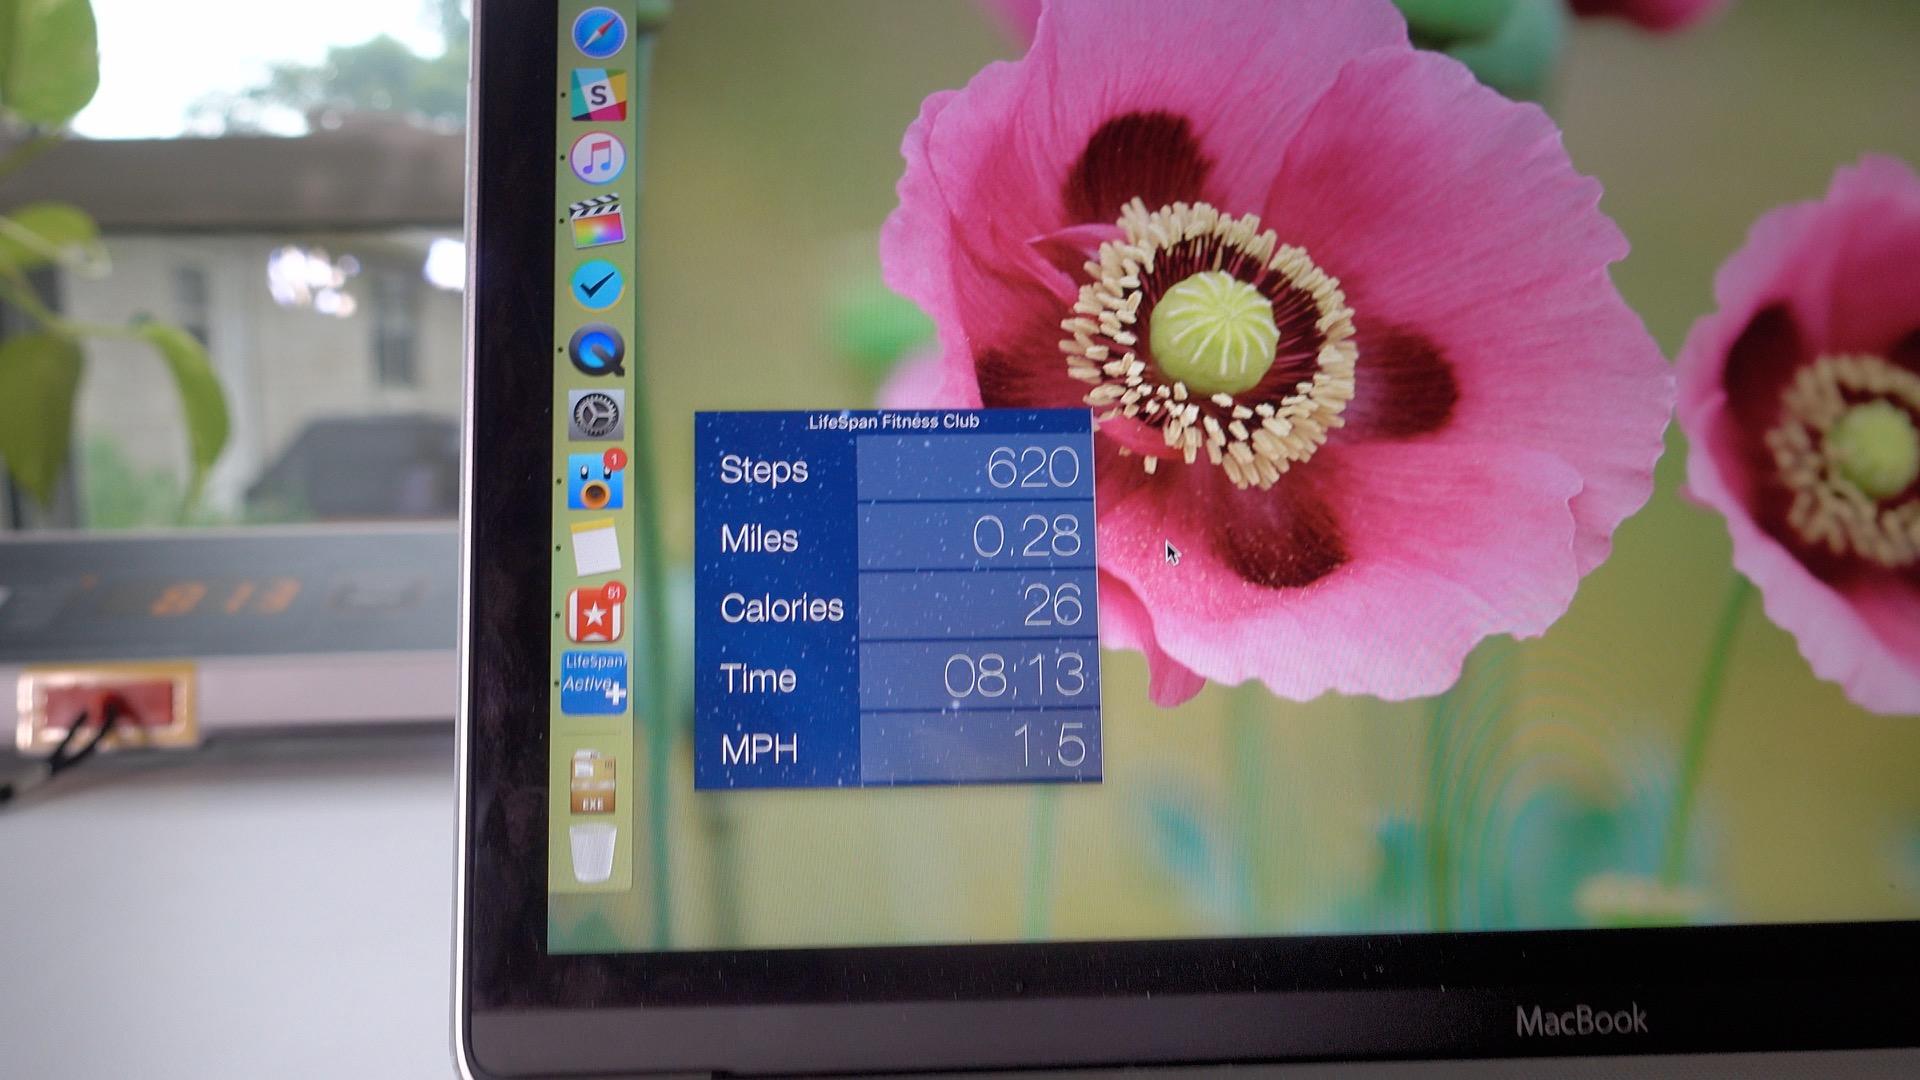 UnderDesk Treadmill LifeSpan Mac App